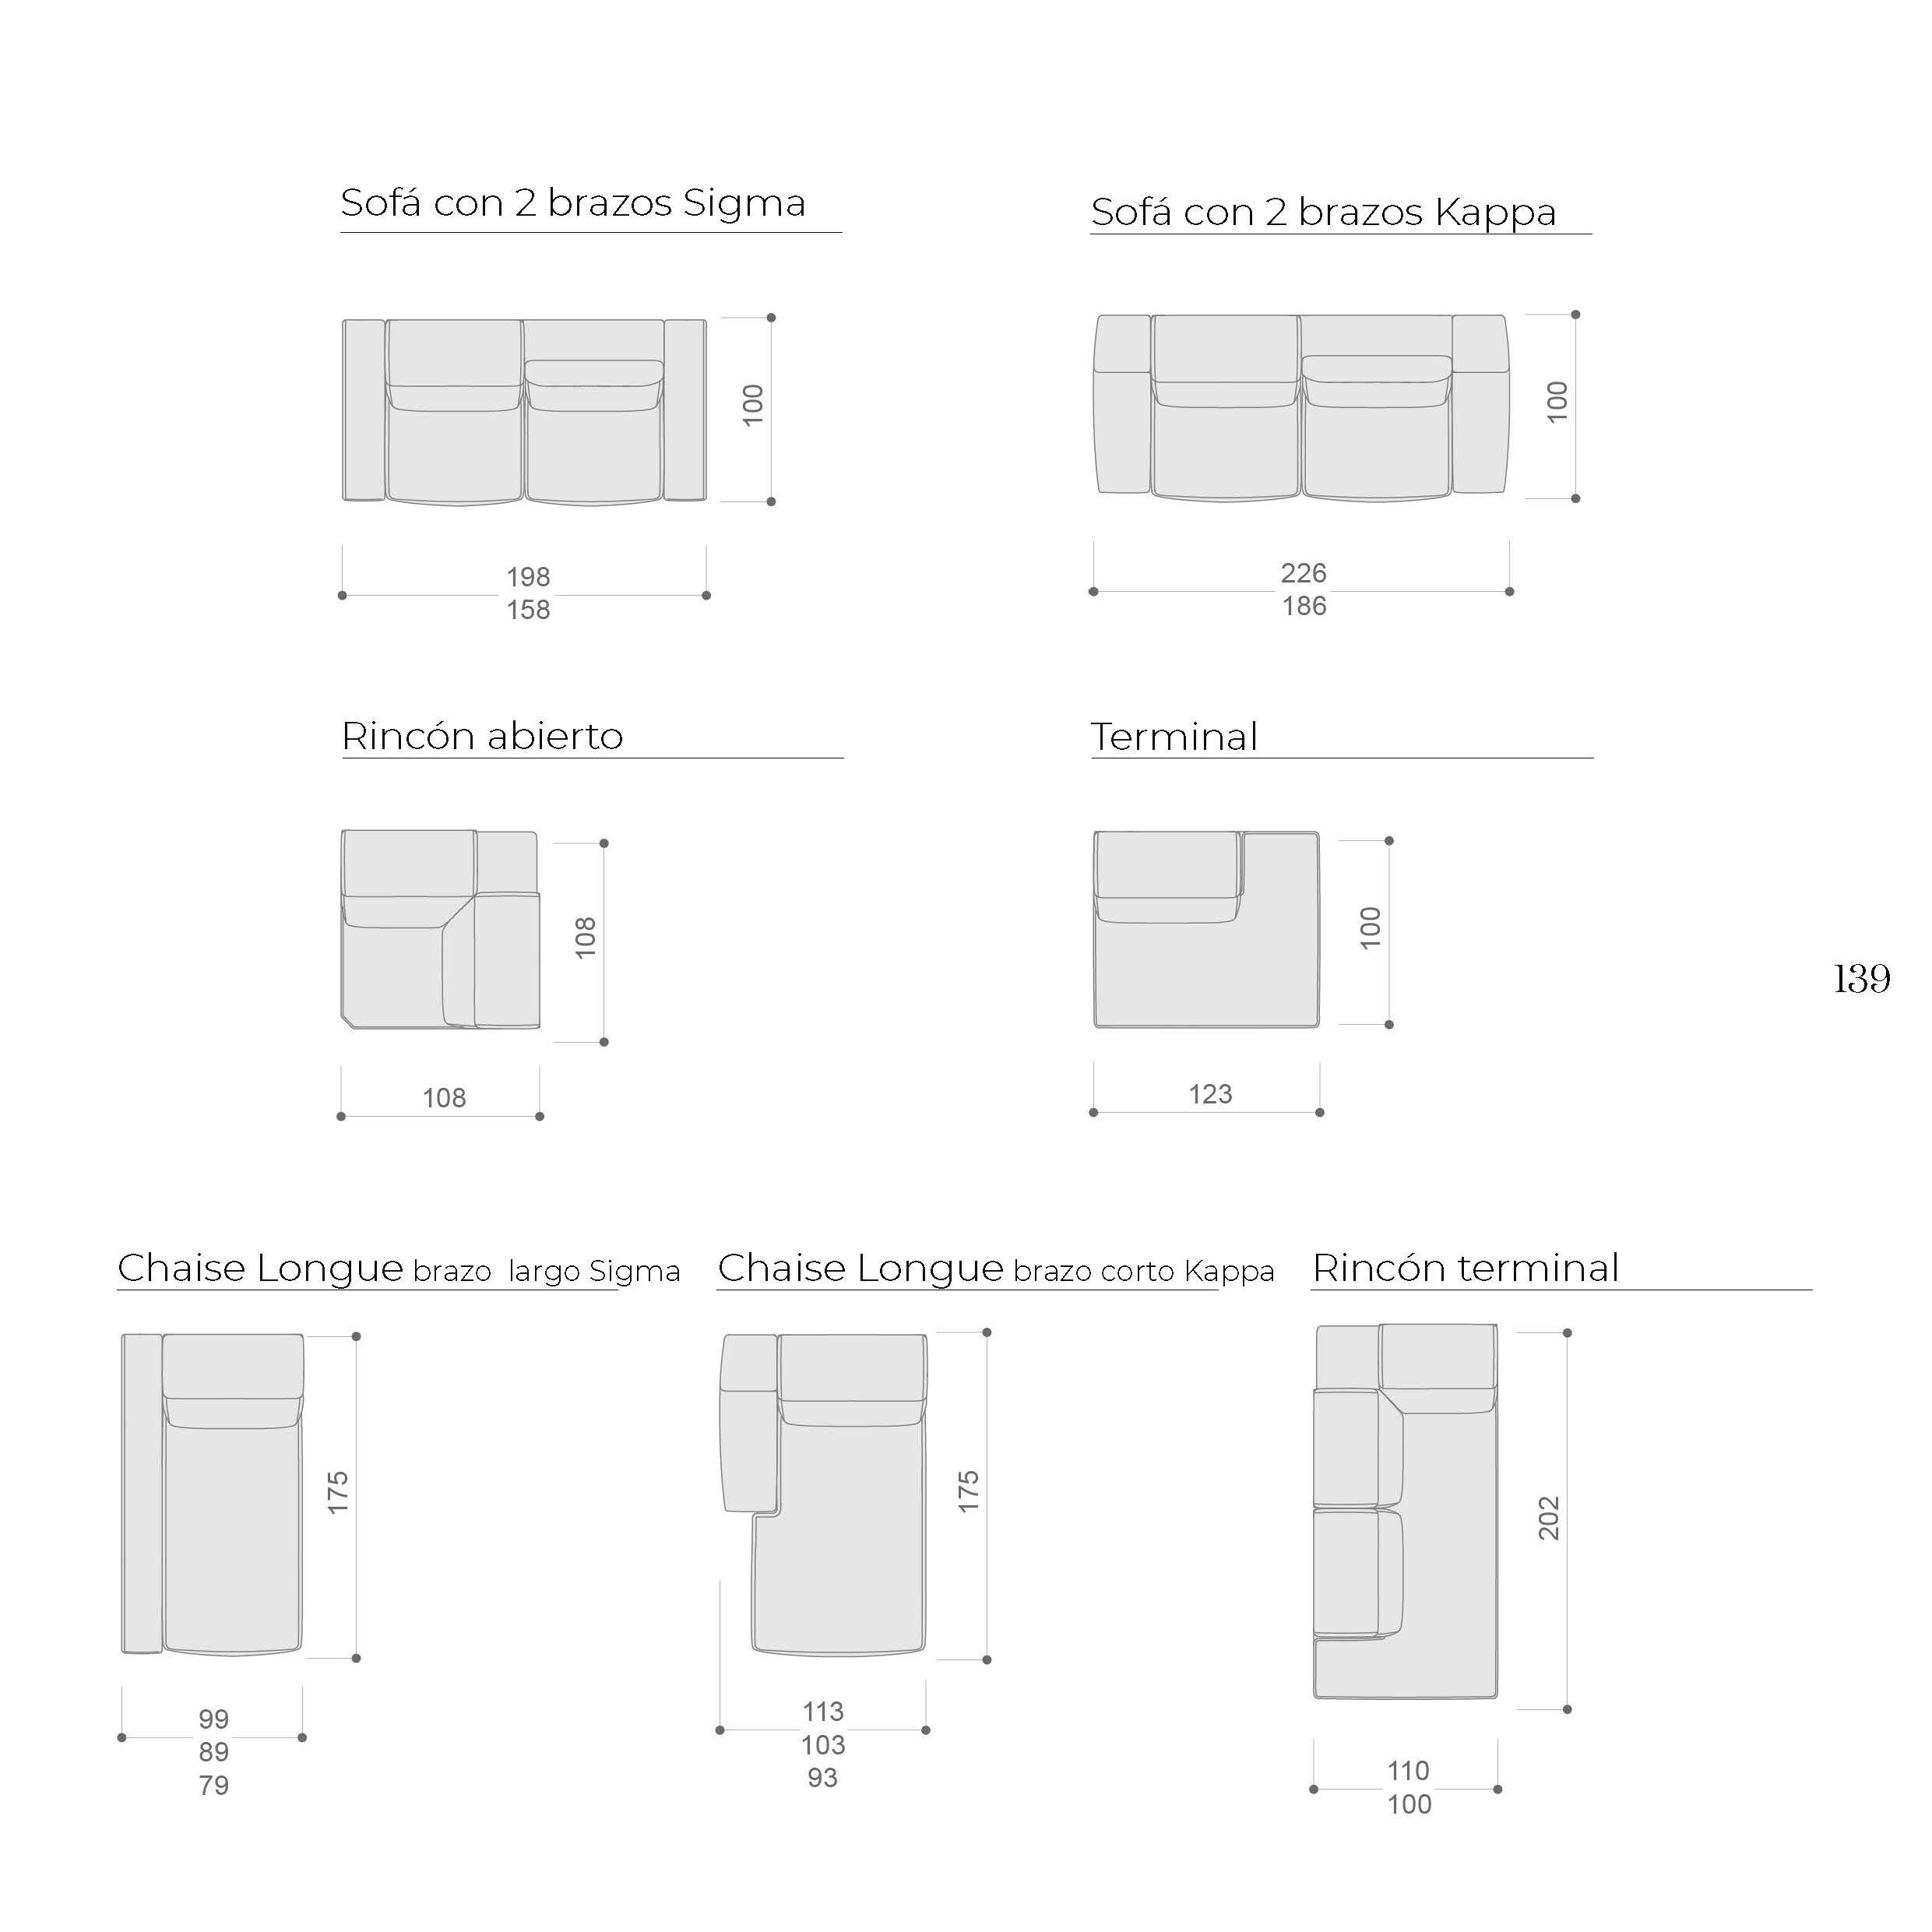 Ficha técnica medidas 10c-0009-10d-0015 sofá con 2brazos y Chaise Longue